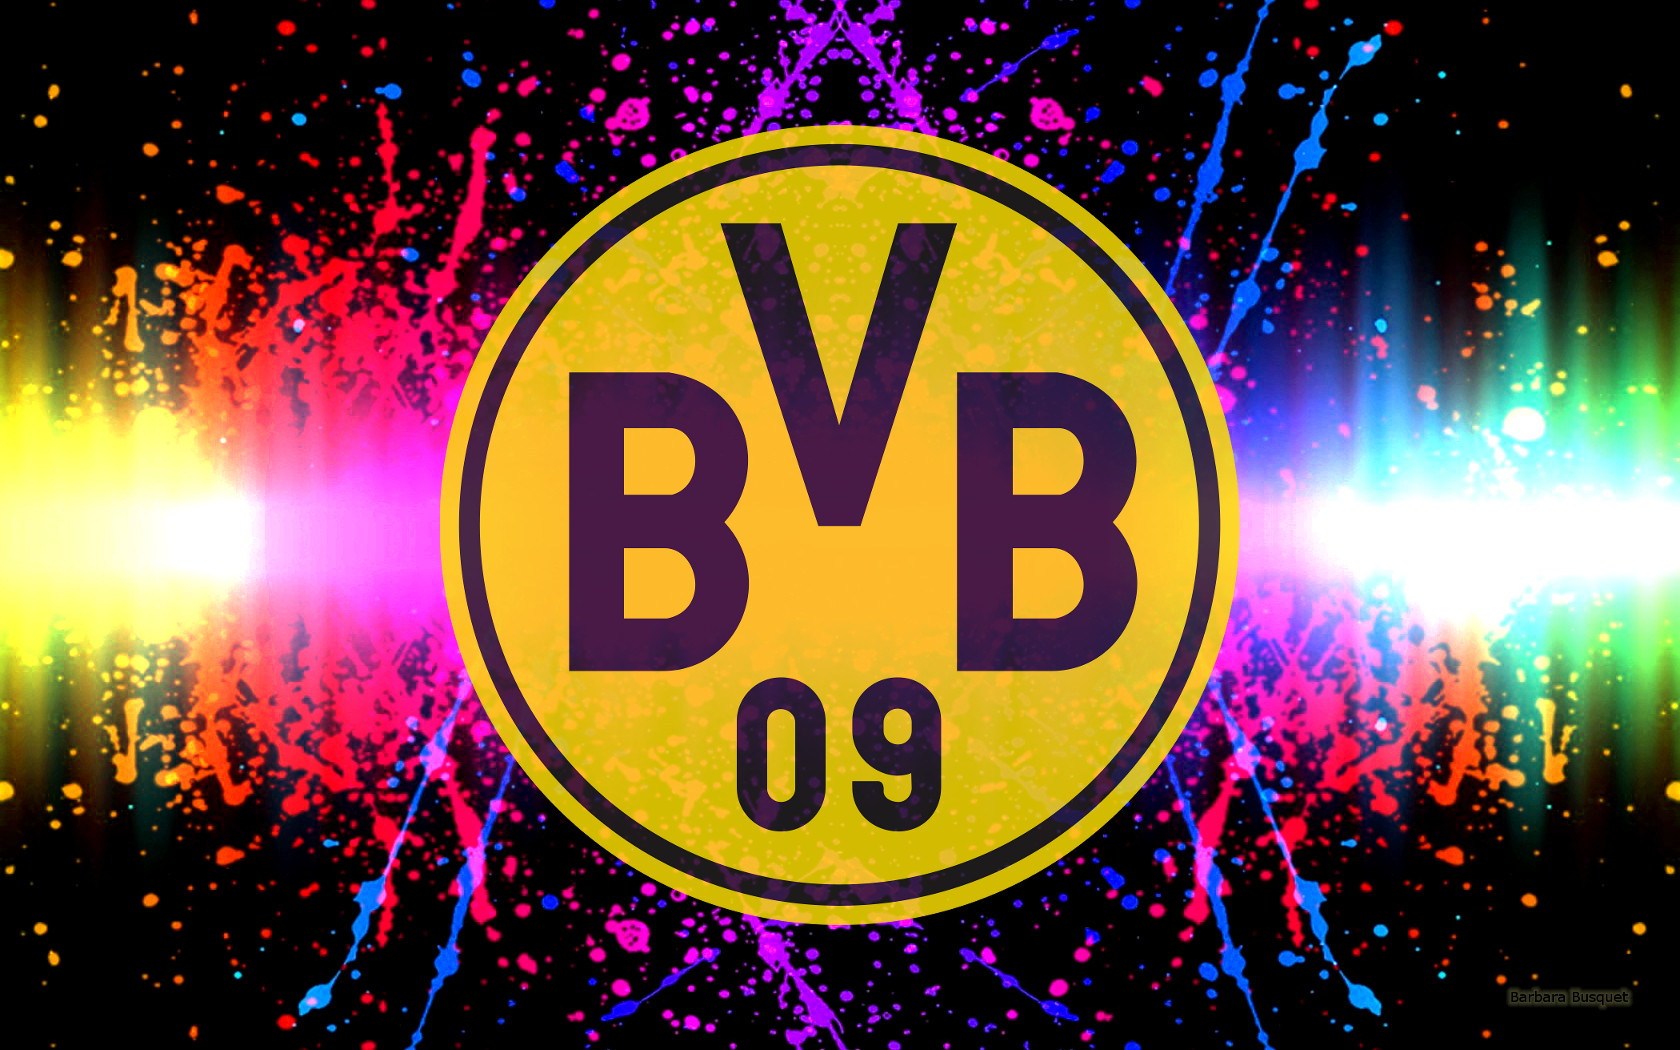 Borussia Dortmund Wallpapers Barbaras Hd Wallpapers